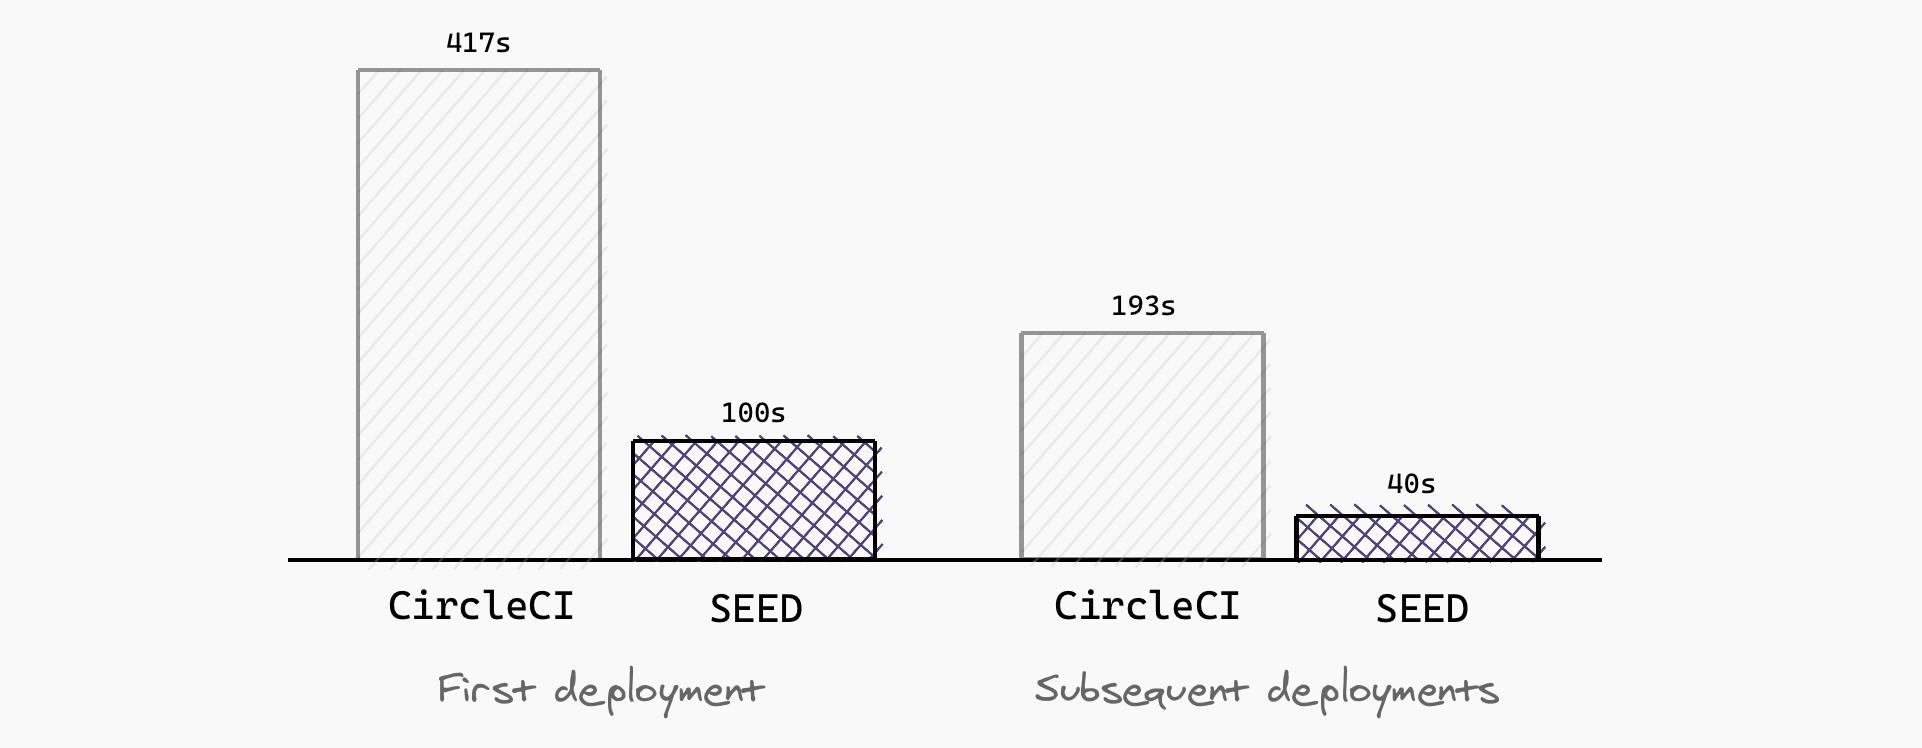 CDK deployments CircleCI vs Seed